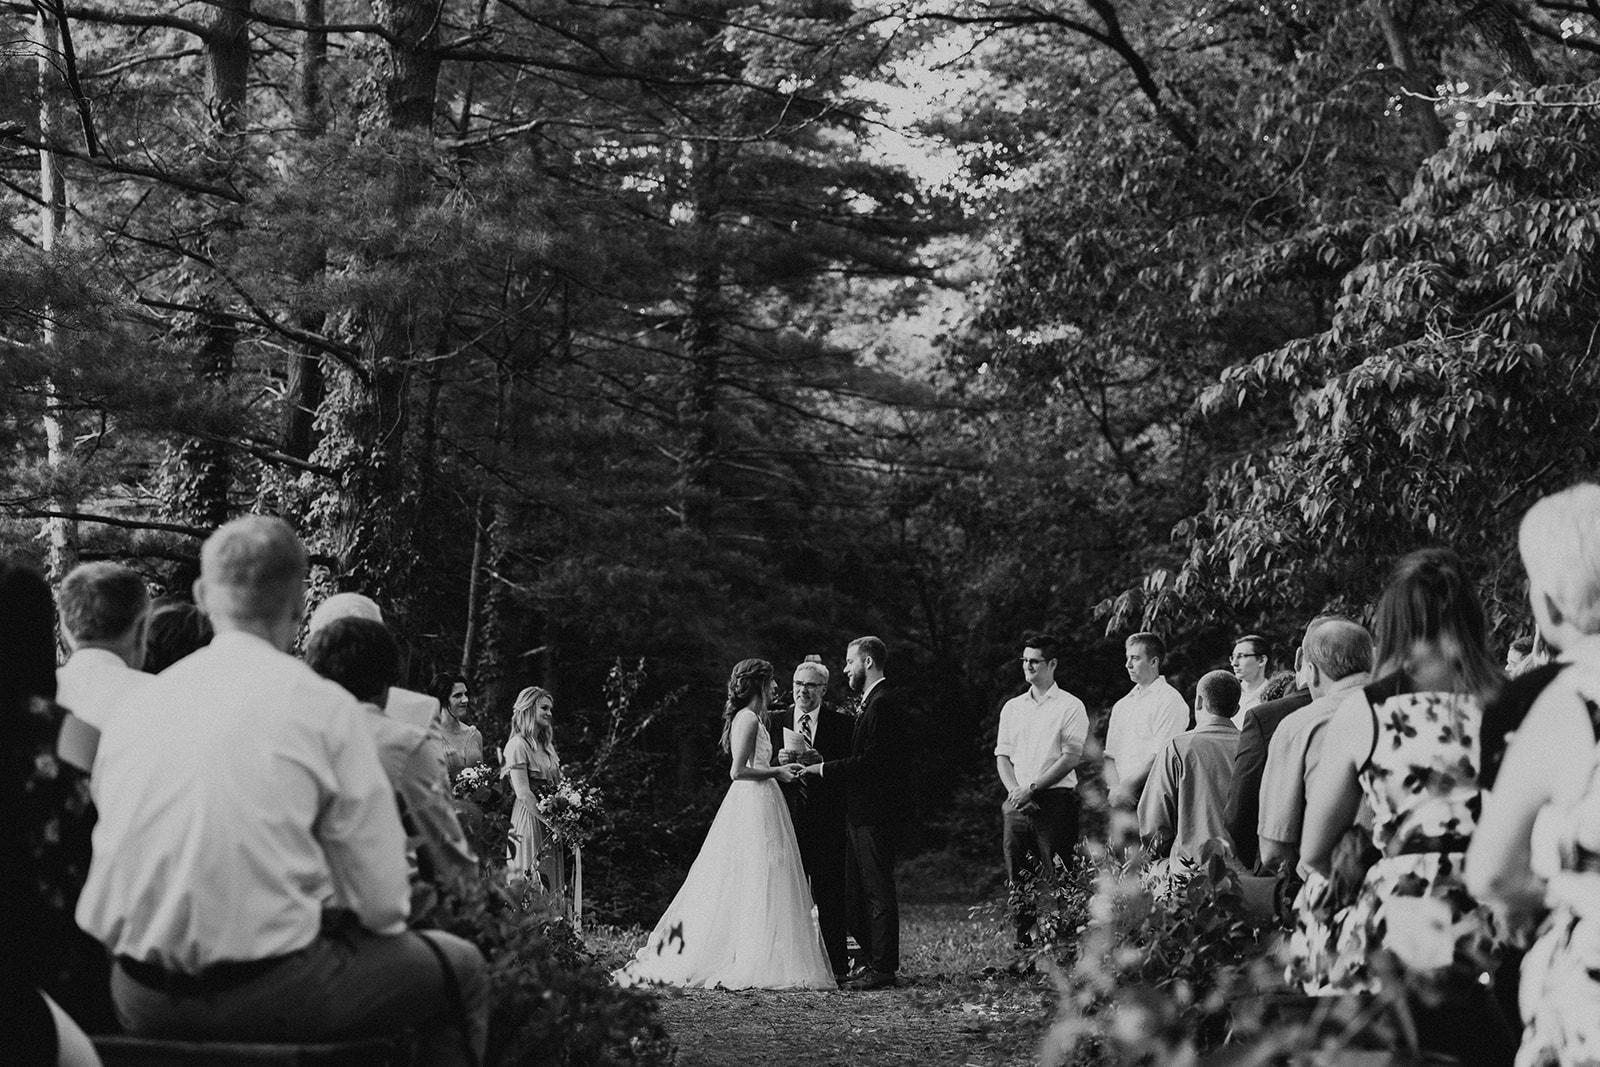 camp_wokanda_peoria_illinois_wedding_photographer_wright_photographs_bliese_0271.jpg